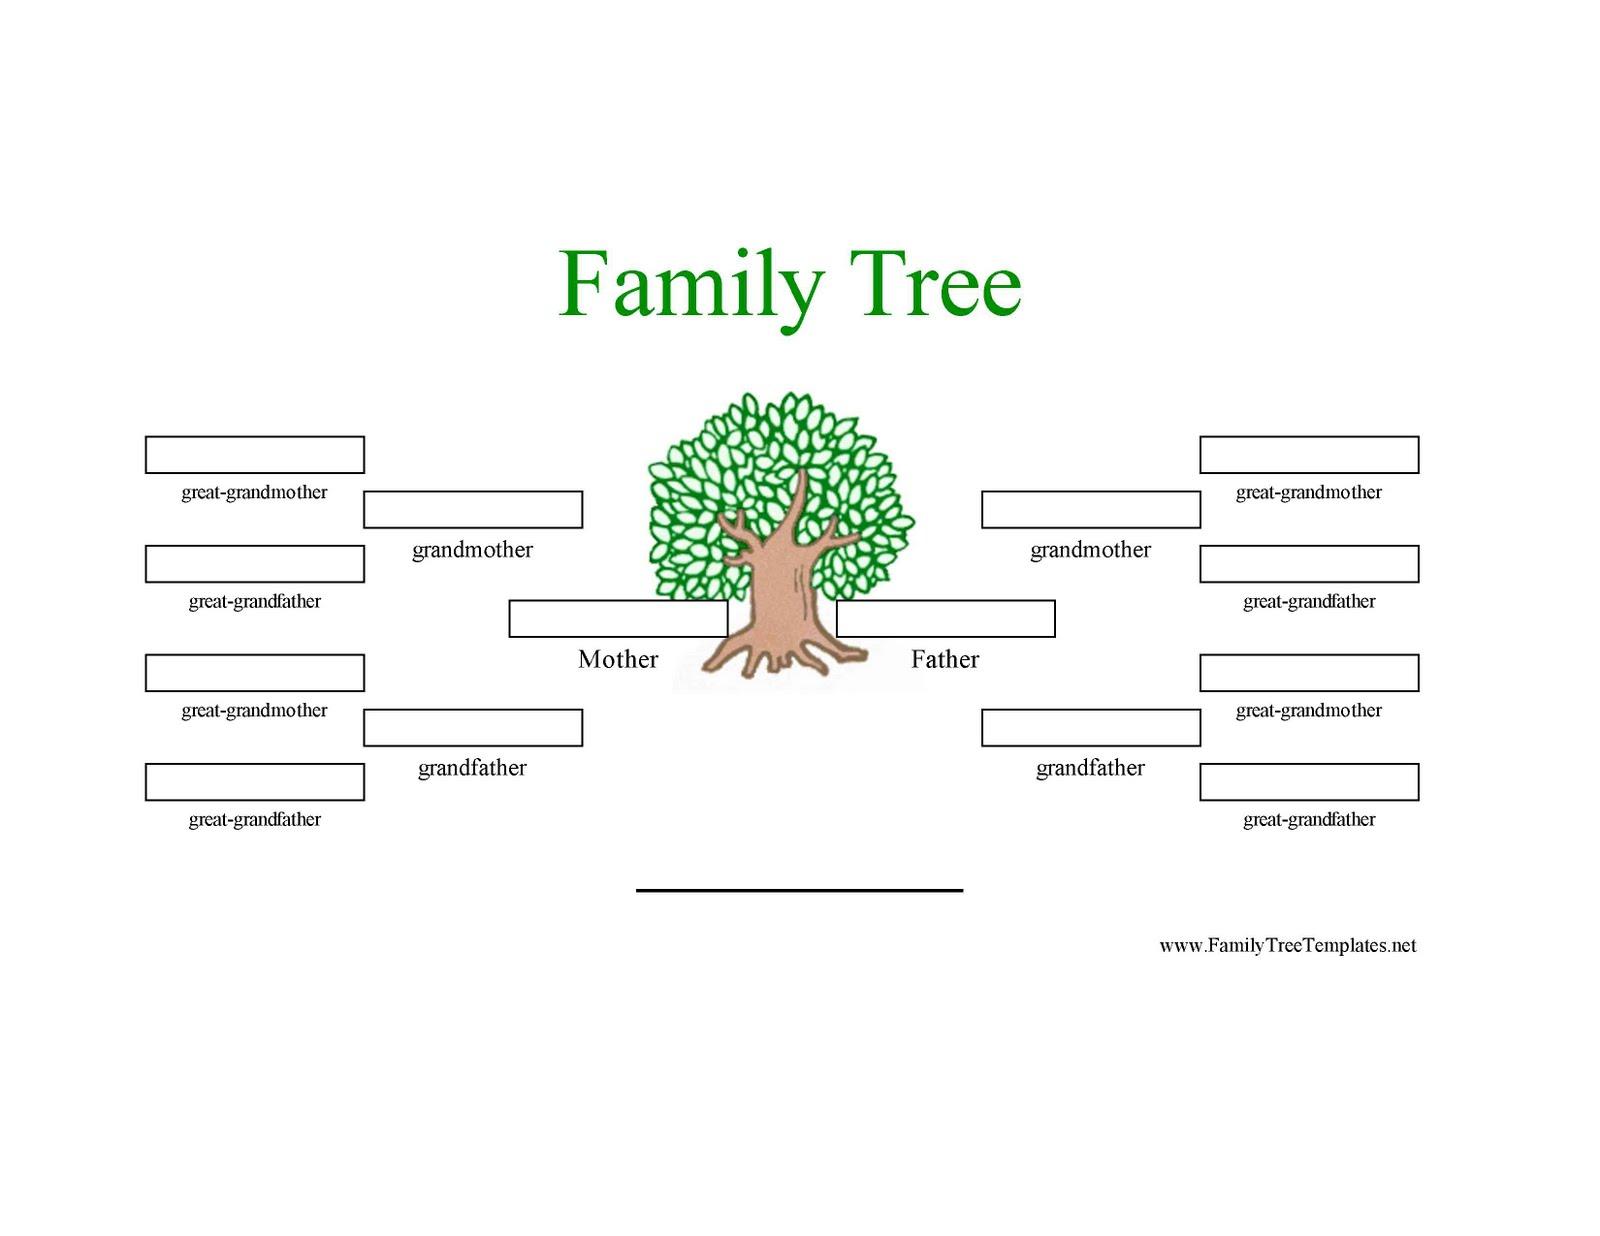 Family Tree Template Family Tree Template 3 Generations